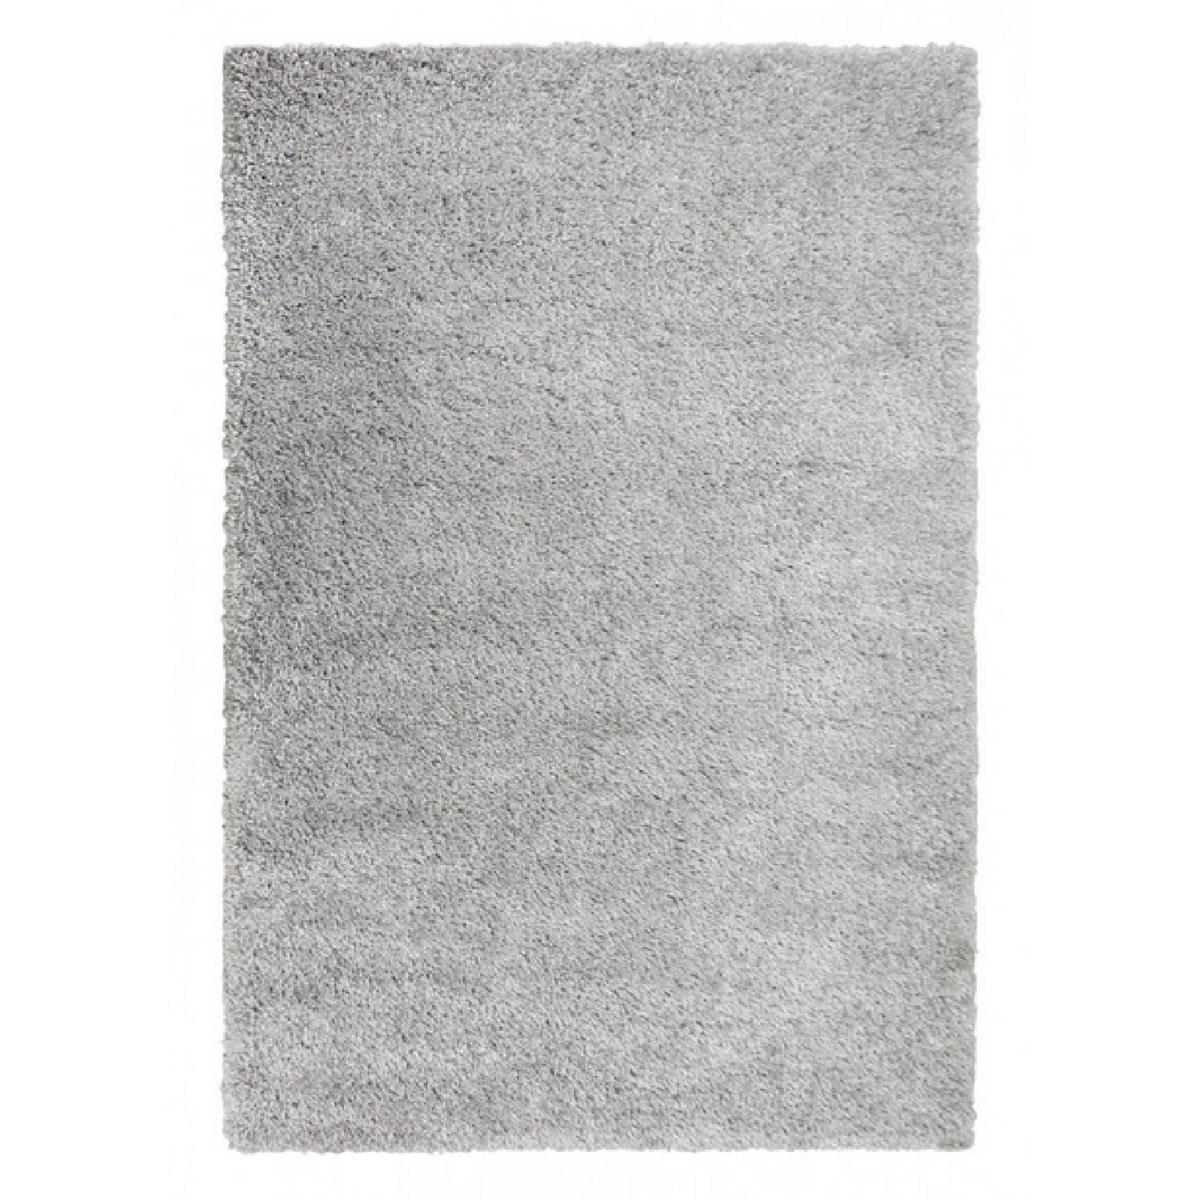 Tapis shaggy en Polypropylène Gris 160x230 cm